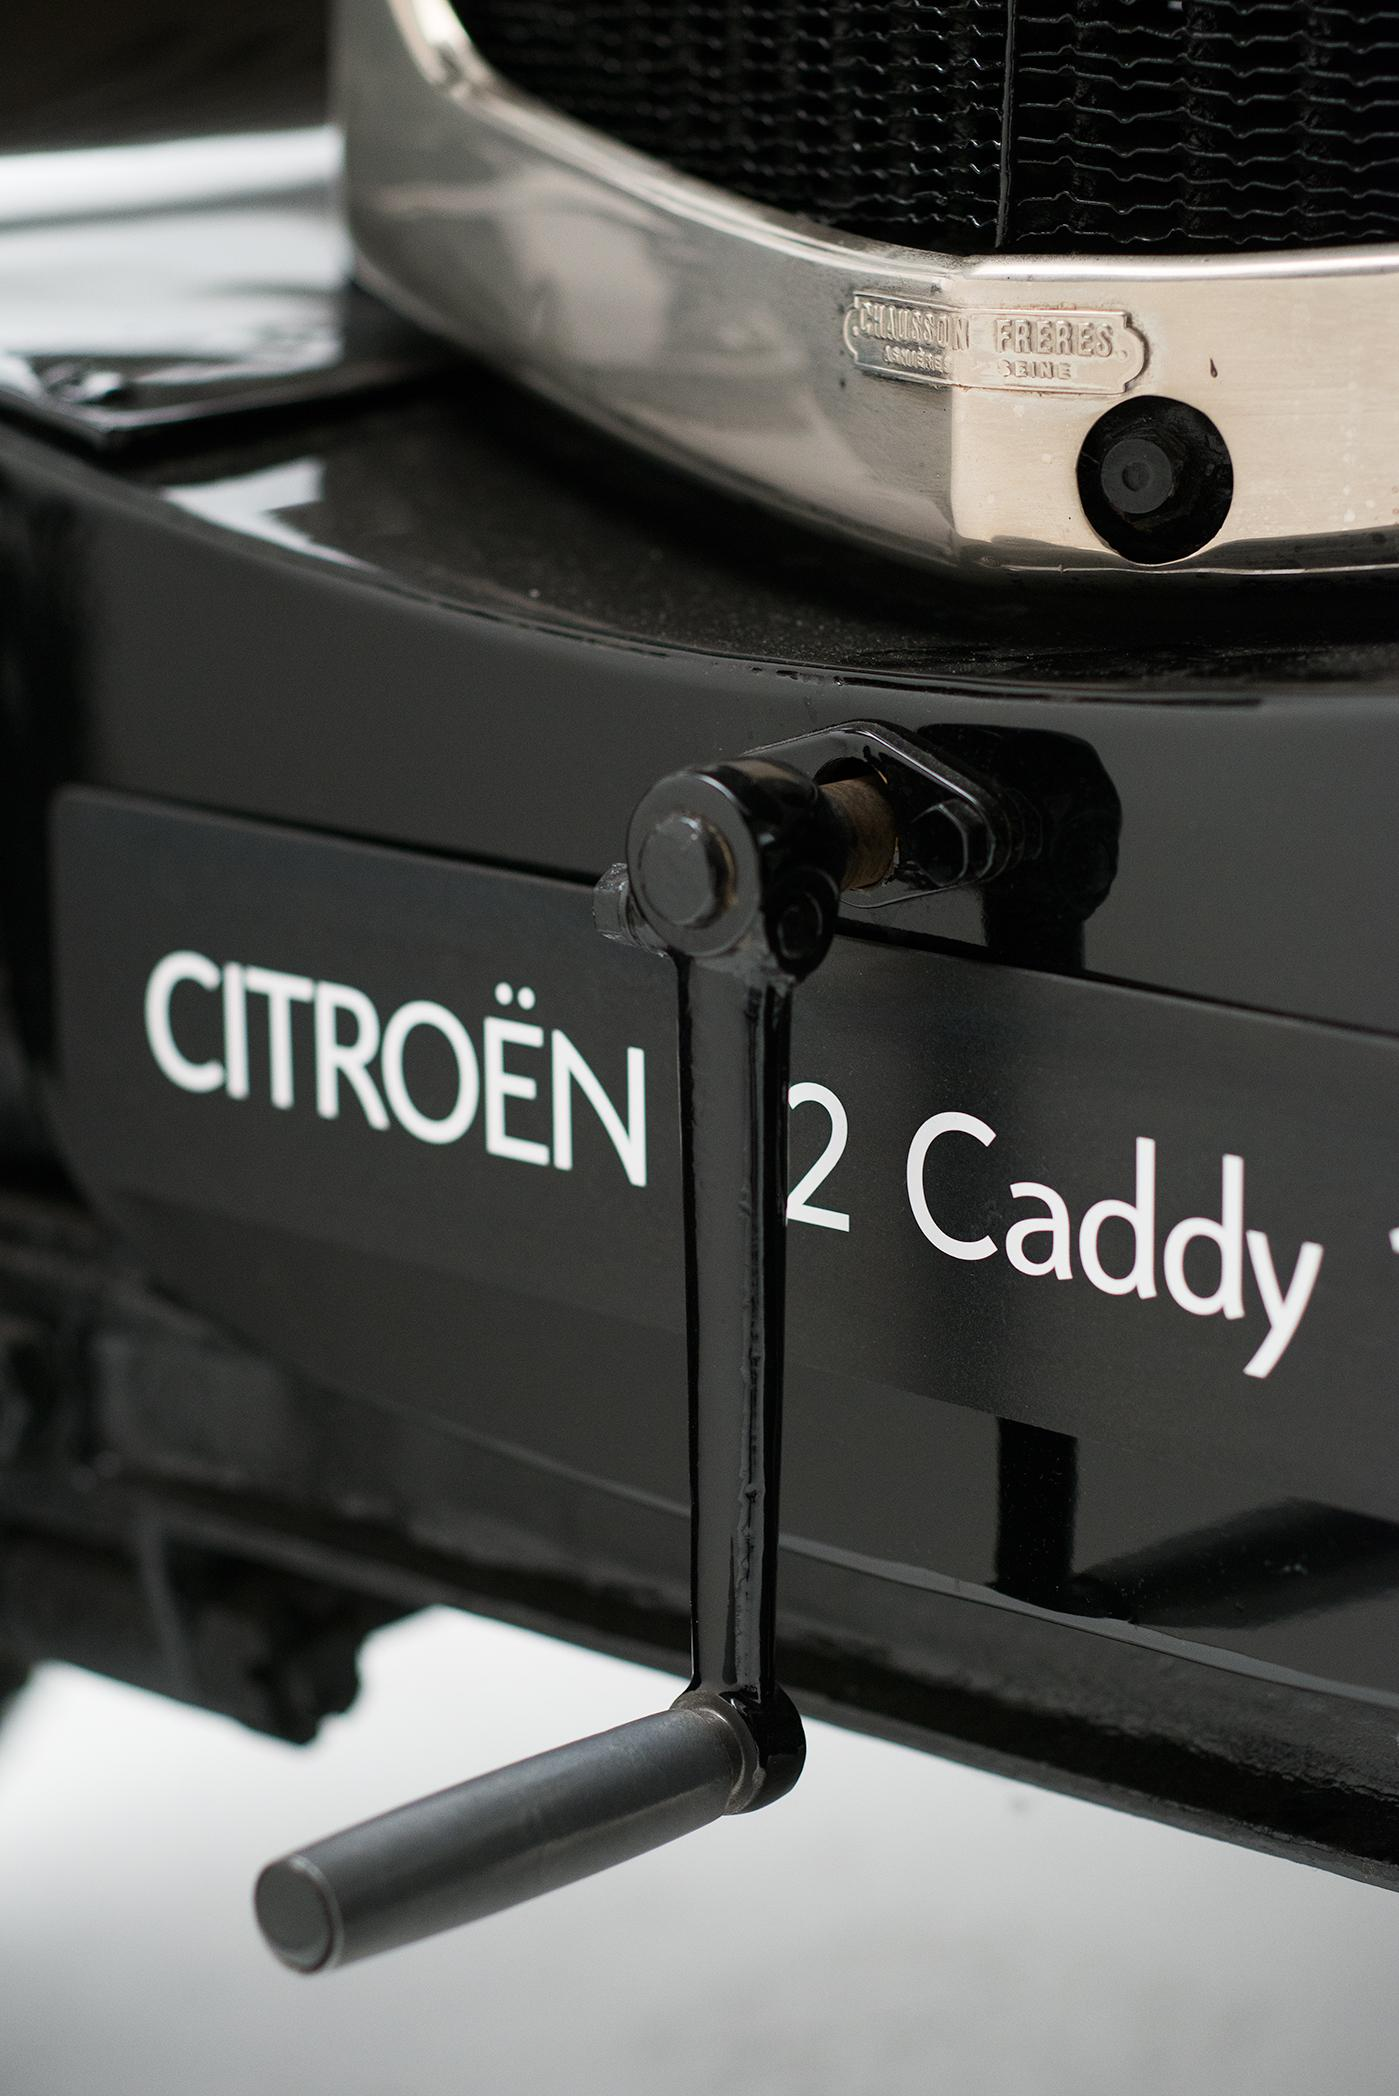 B2 Caddy - détail